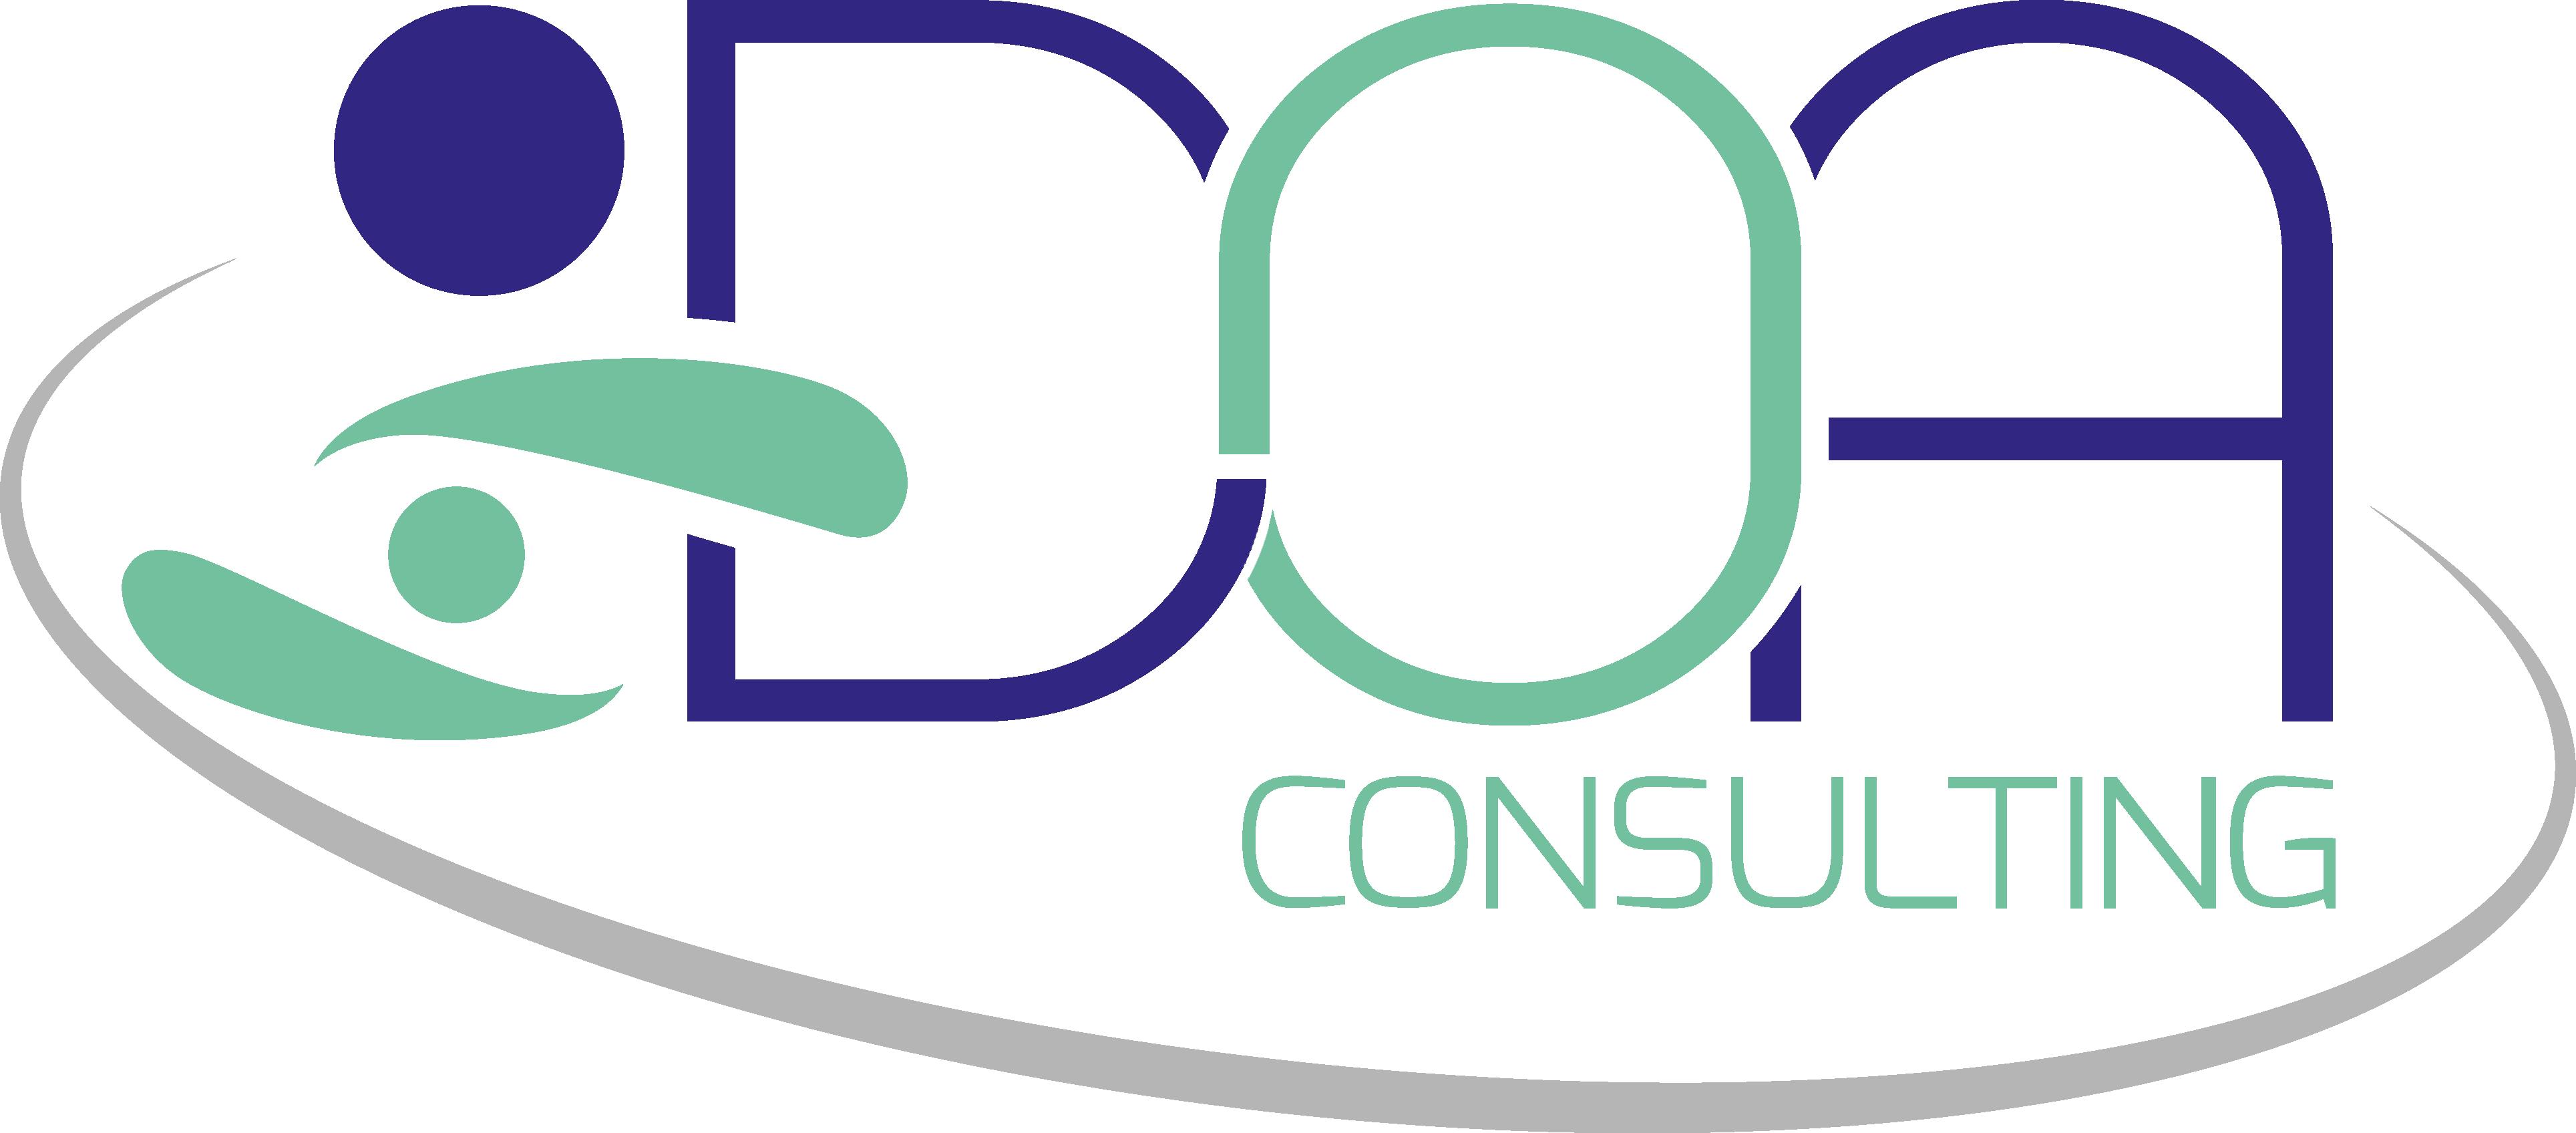 Doa consulting